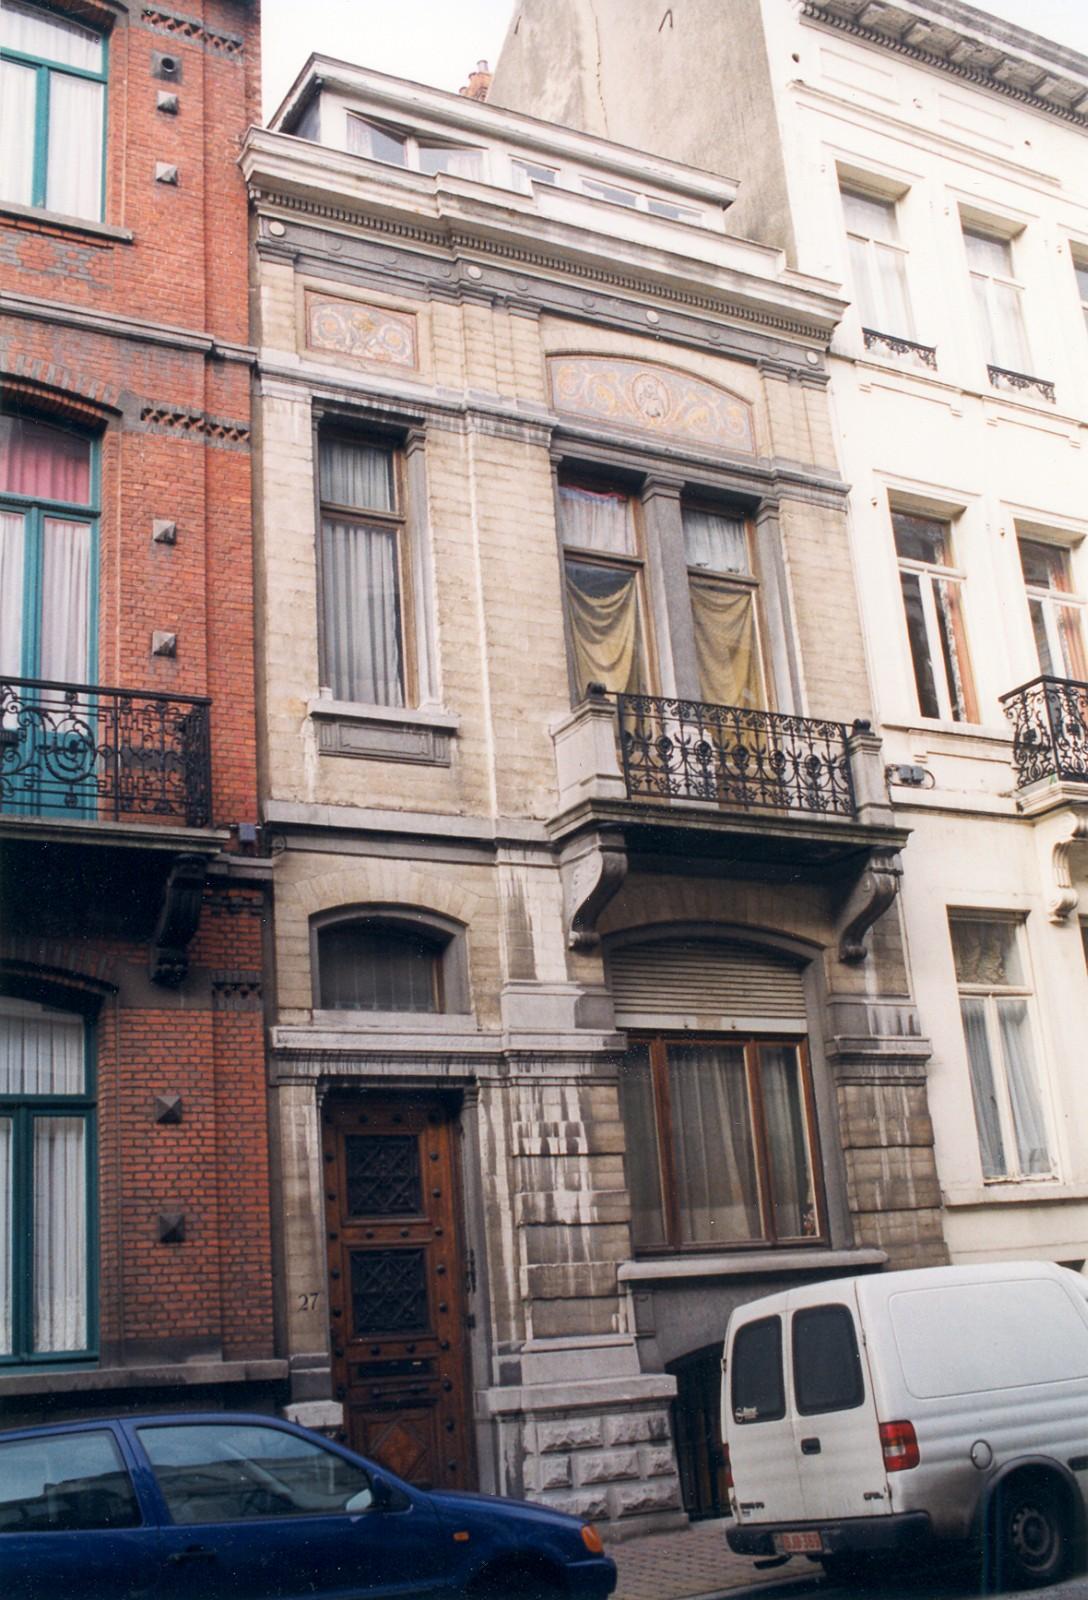 Rue d'Écosse 27., 1999